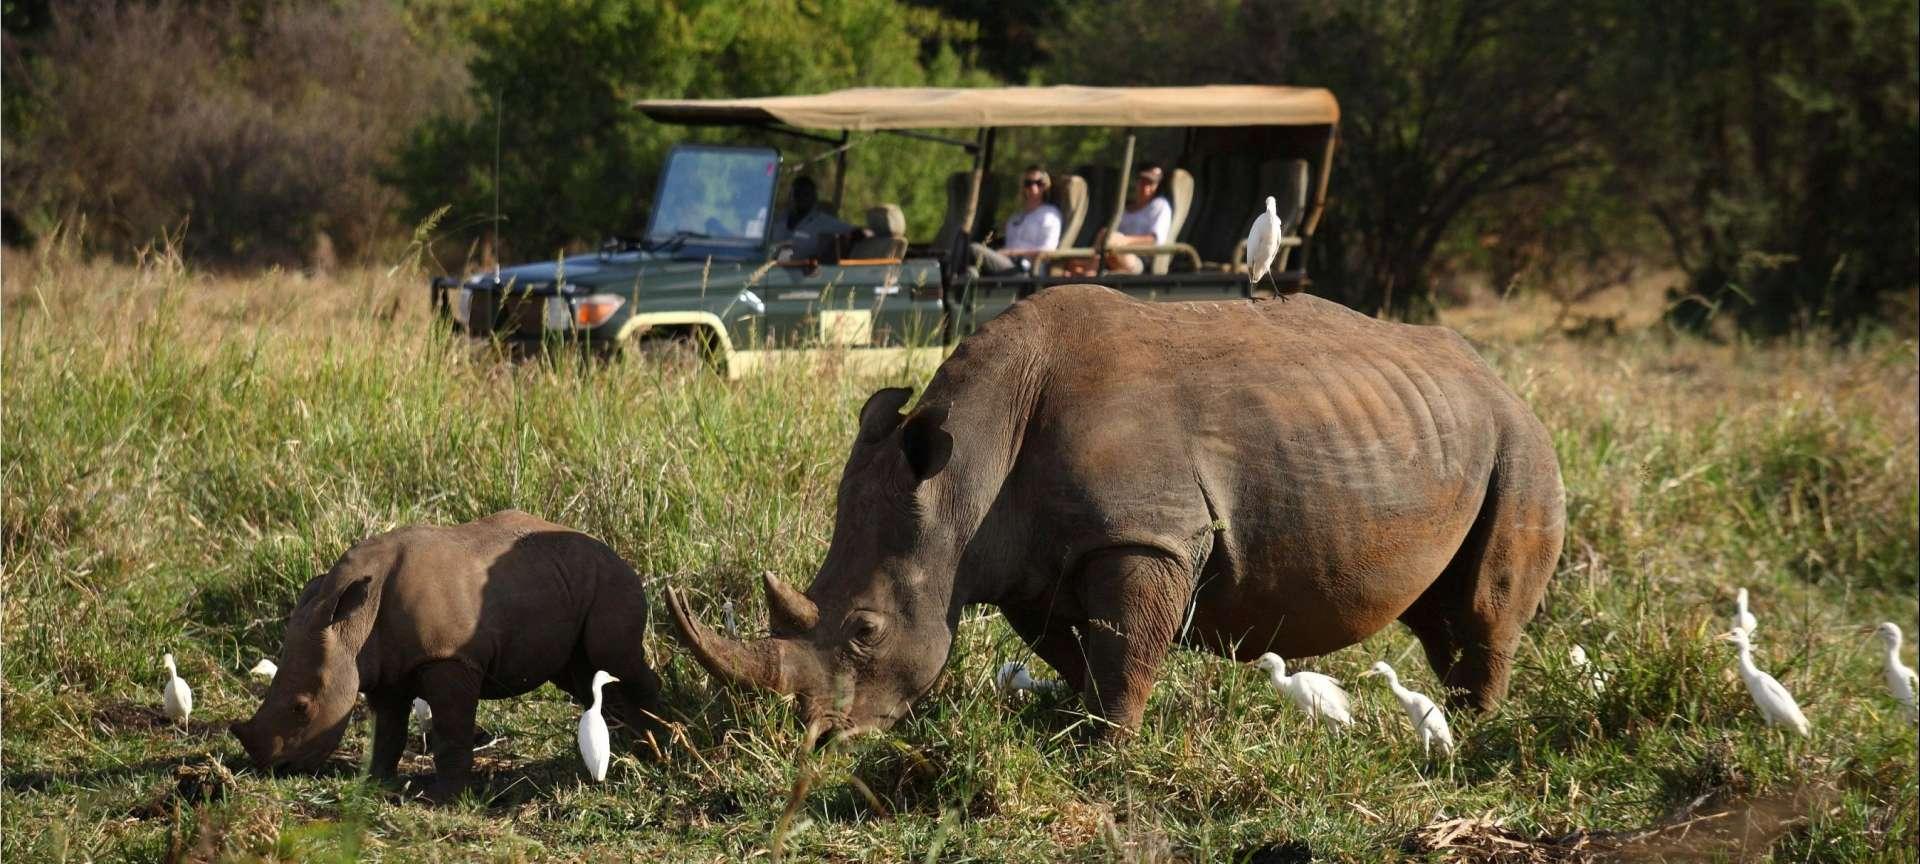 Meru National Park - Africa Wildlife Safaris